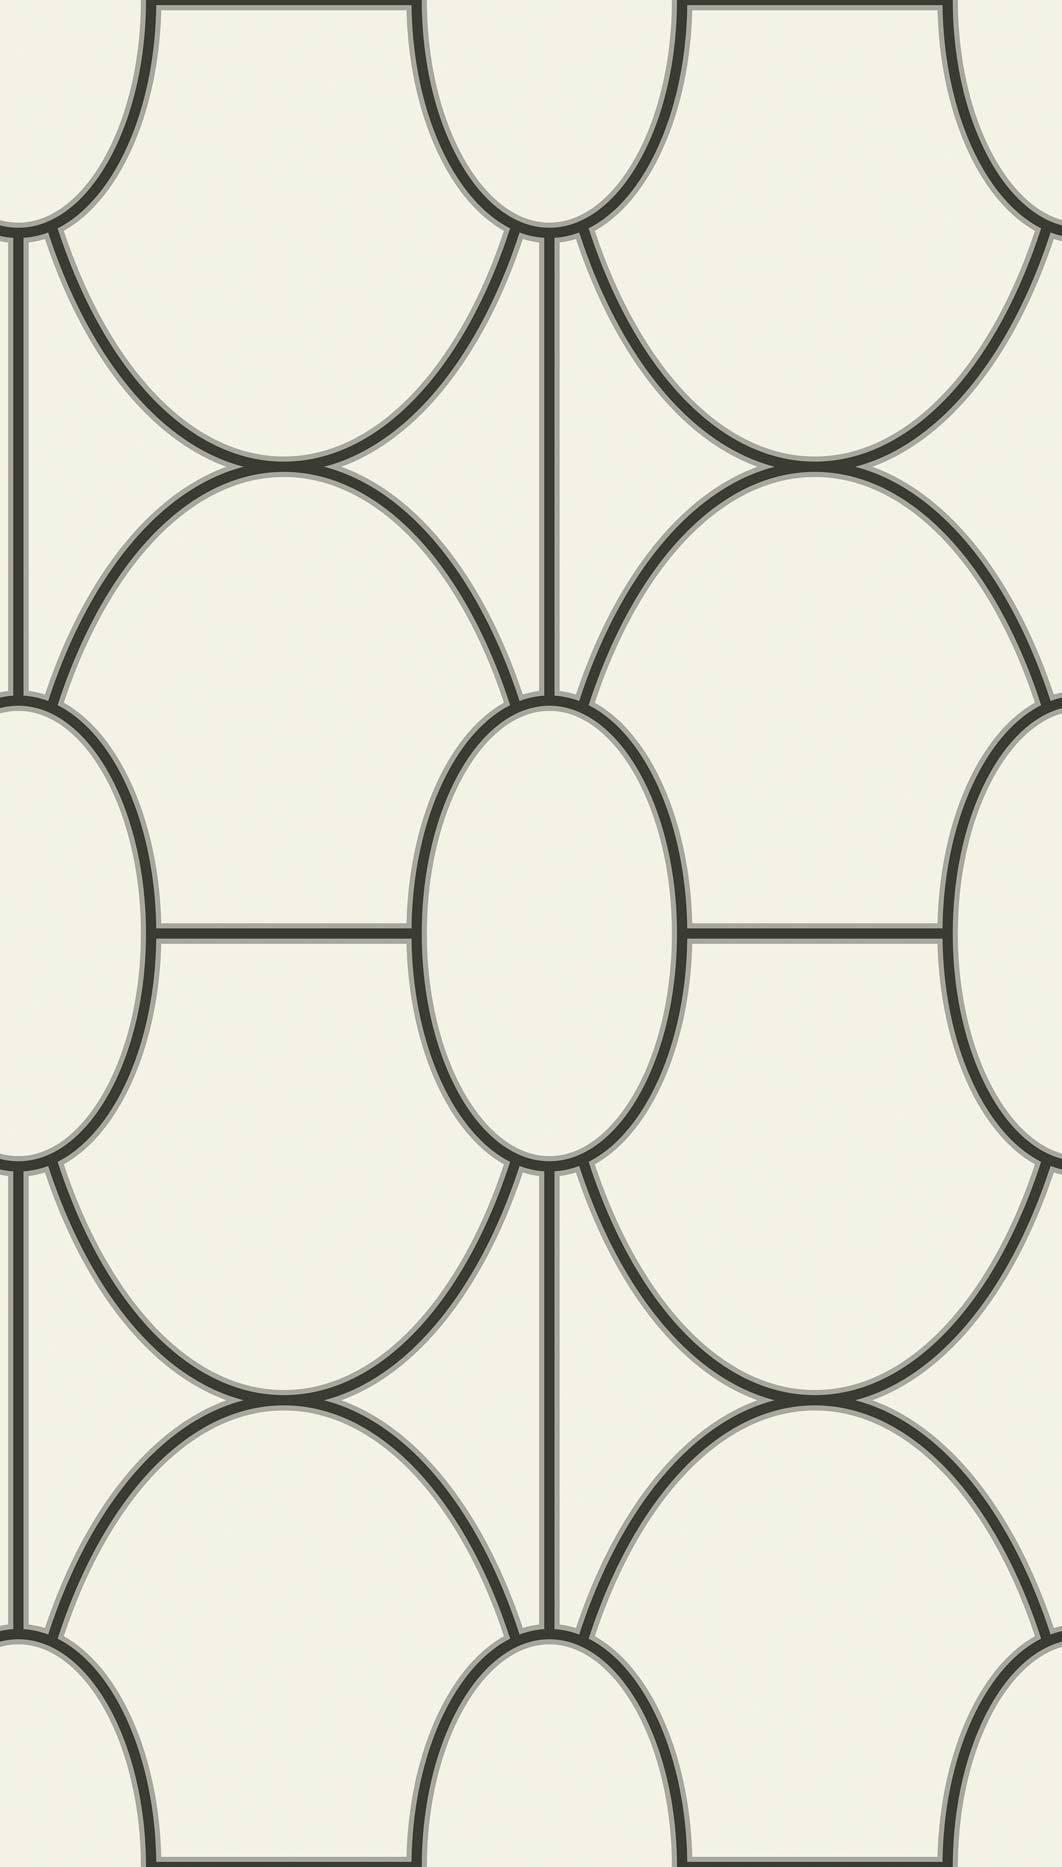 Обои Cole & Son Geometric II 105/6026, интернет магазин Волео